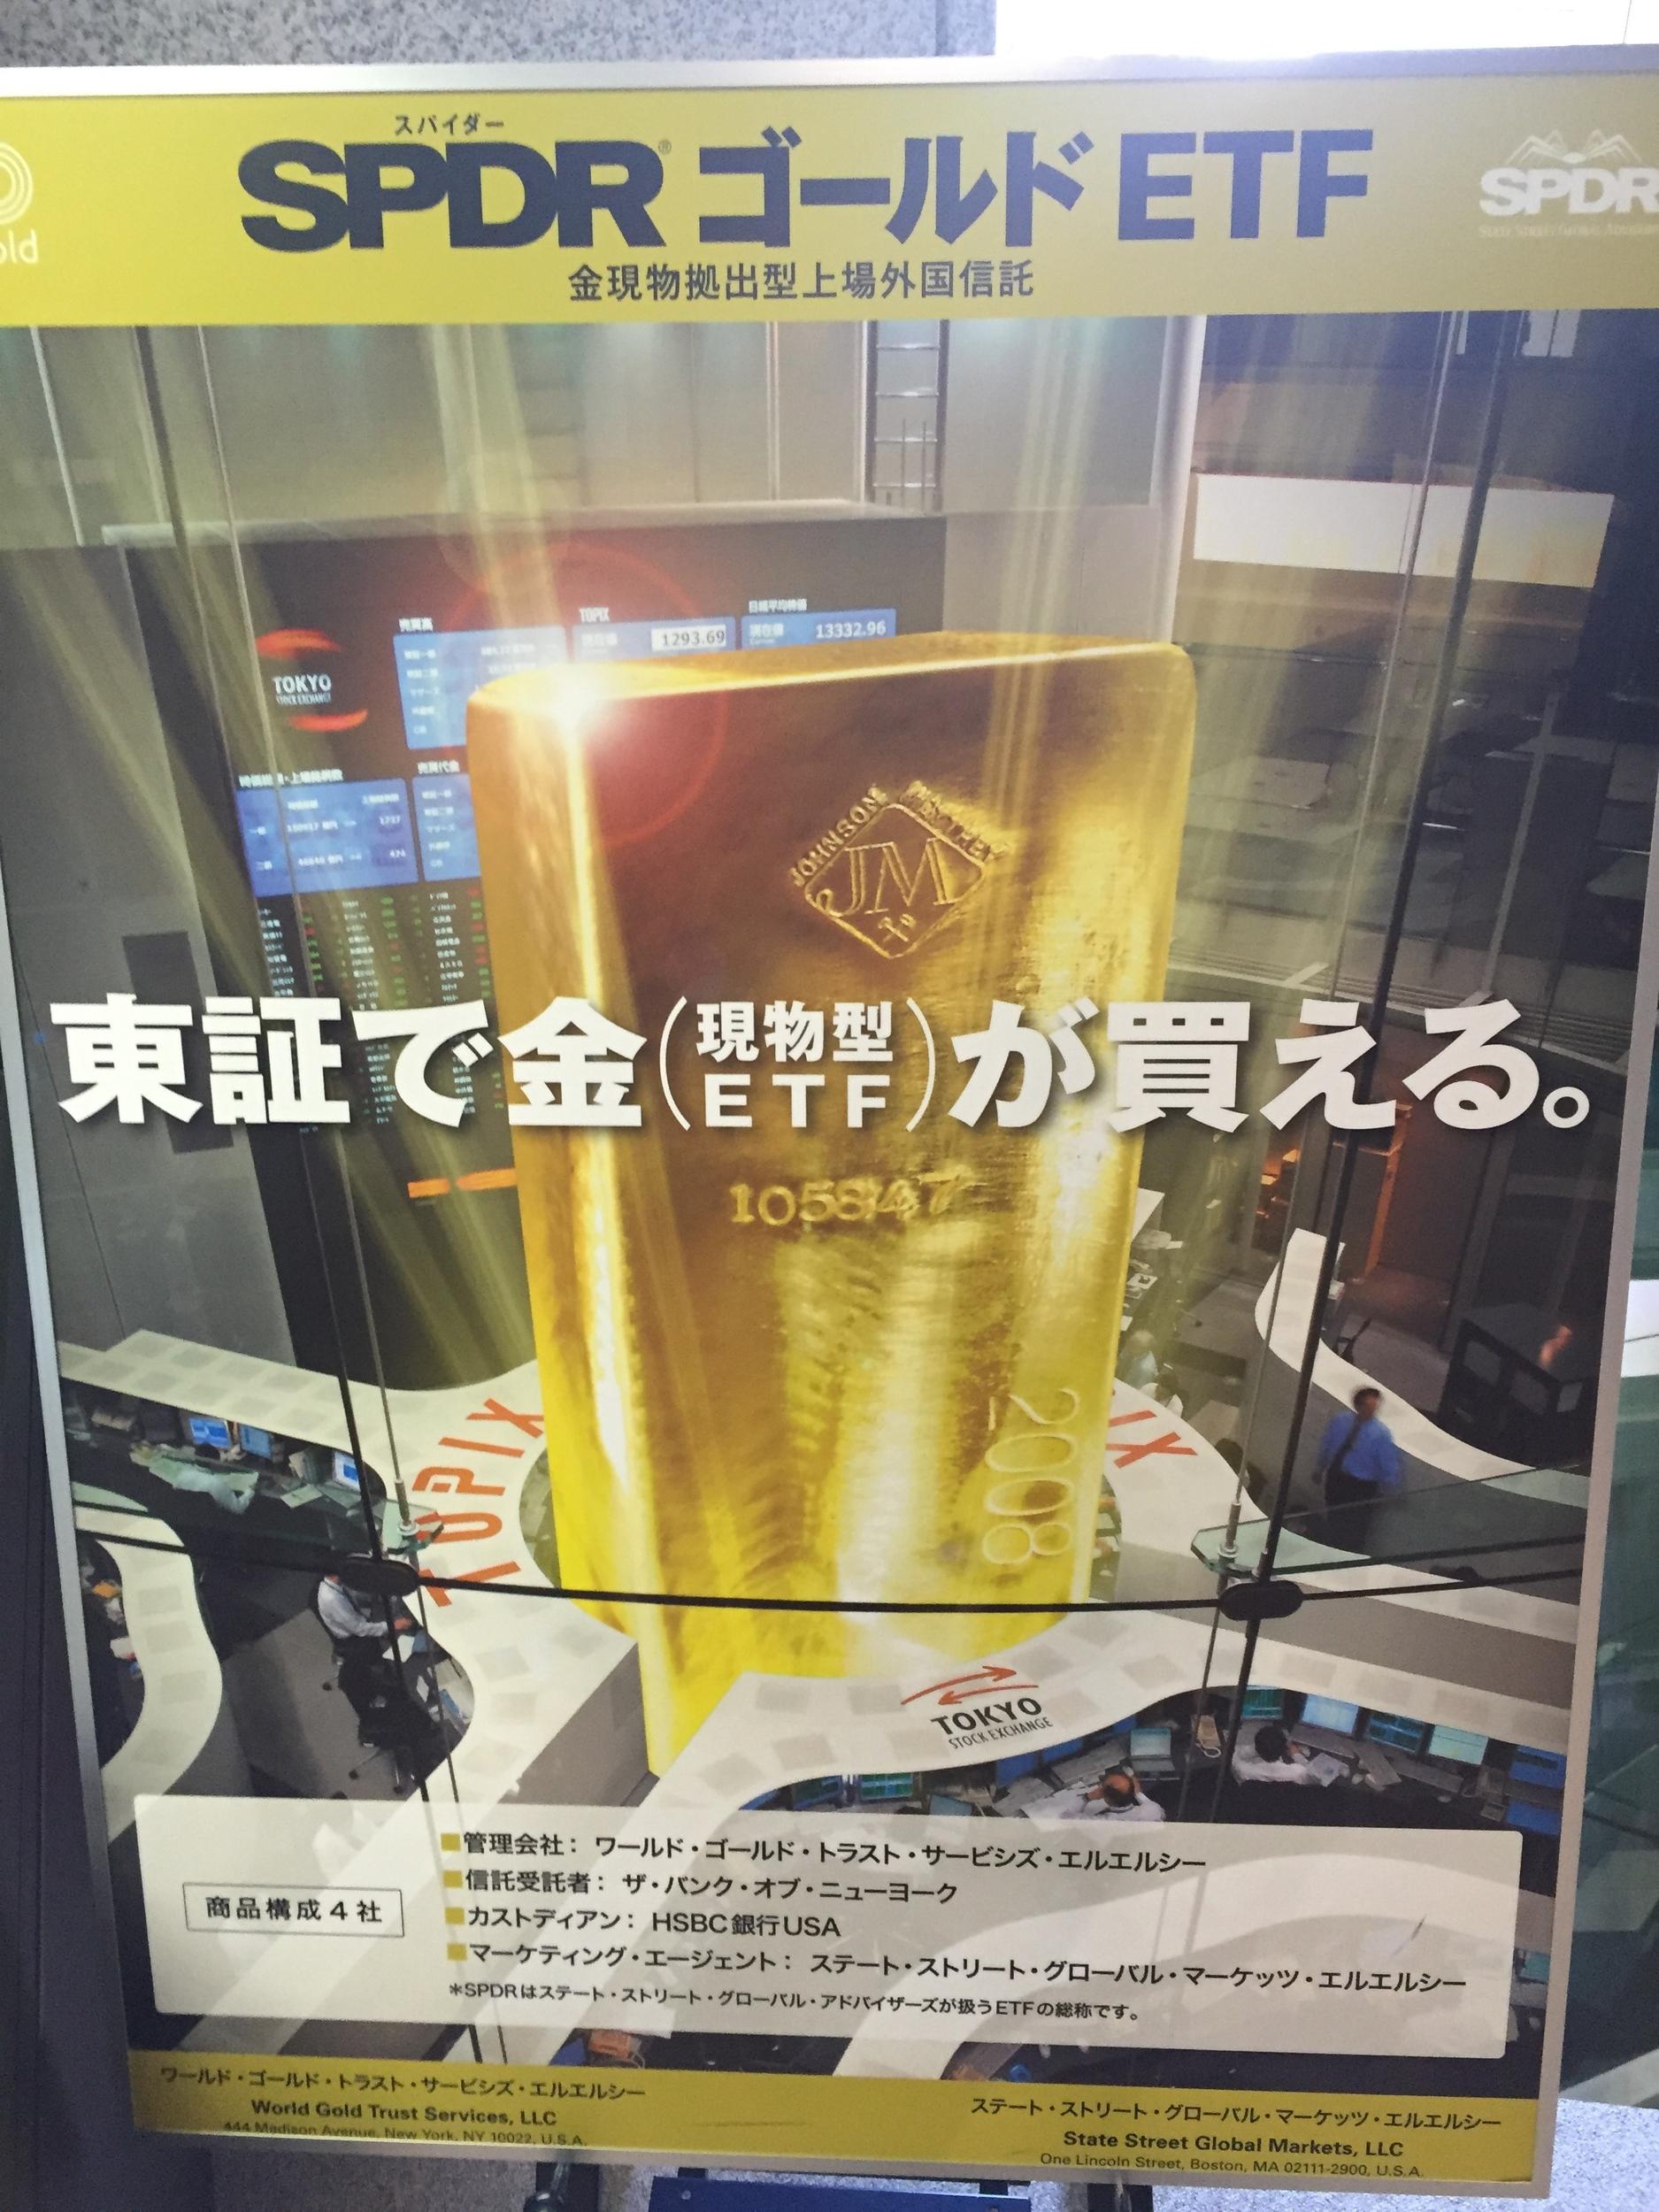 Gold SPDR ETF Poster in the Tokyo Stock Exchange